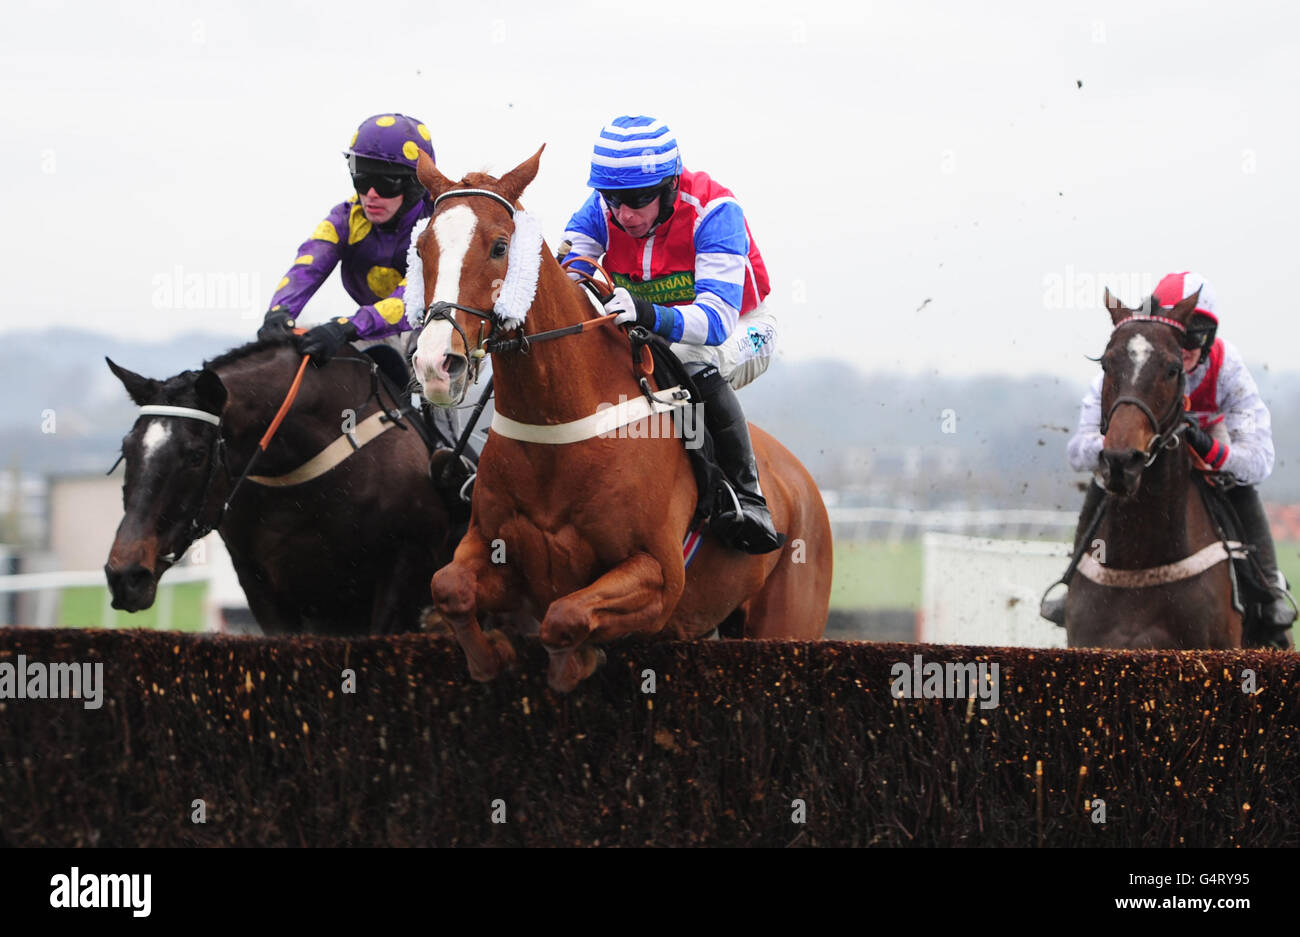 Christmas Horse Racing.Horse Racing Christmas Raceday Plumpton Racecourse Stock